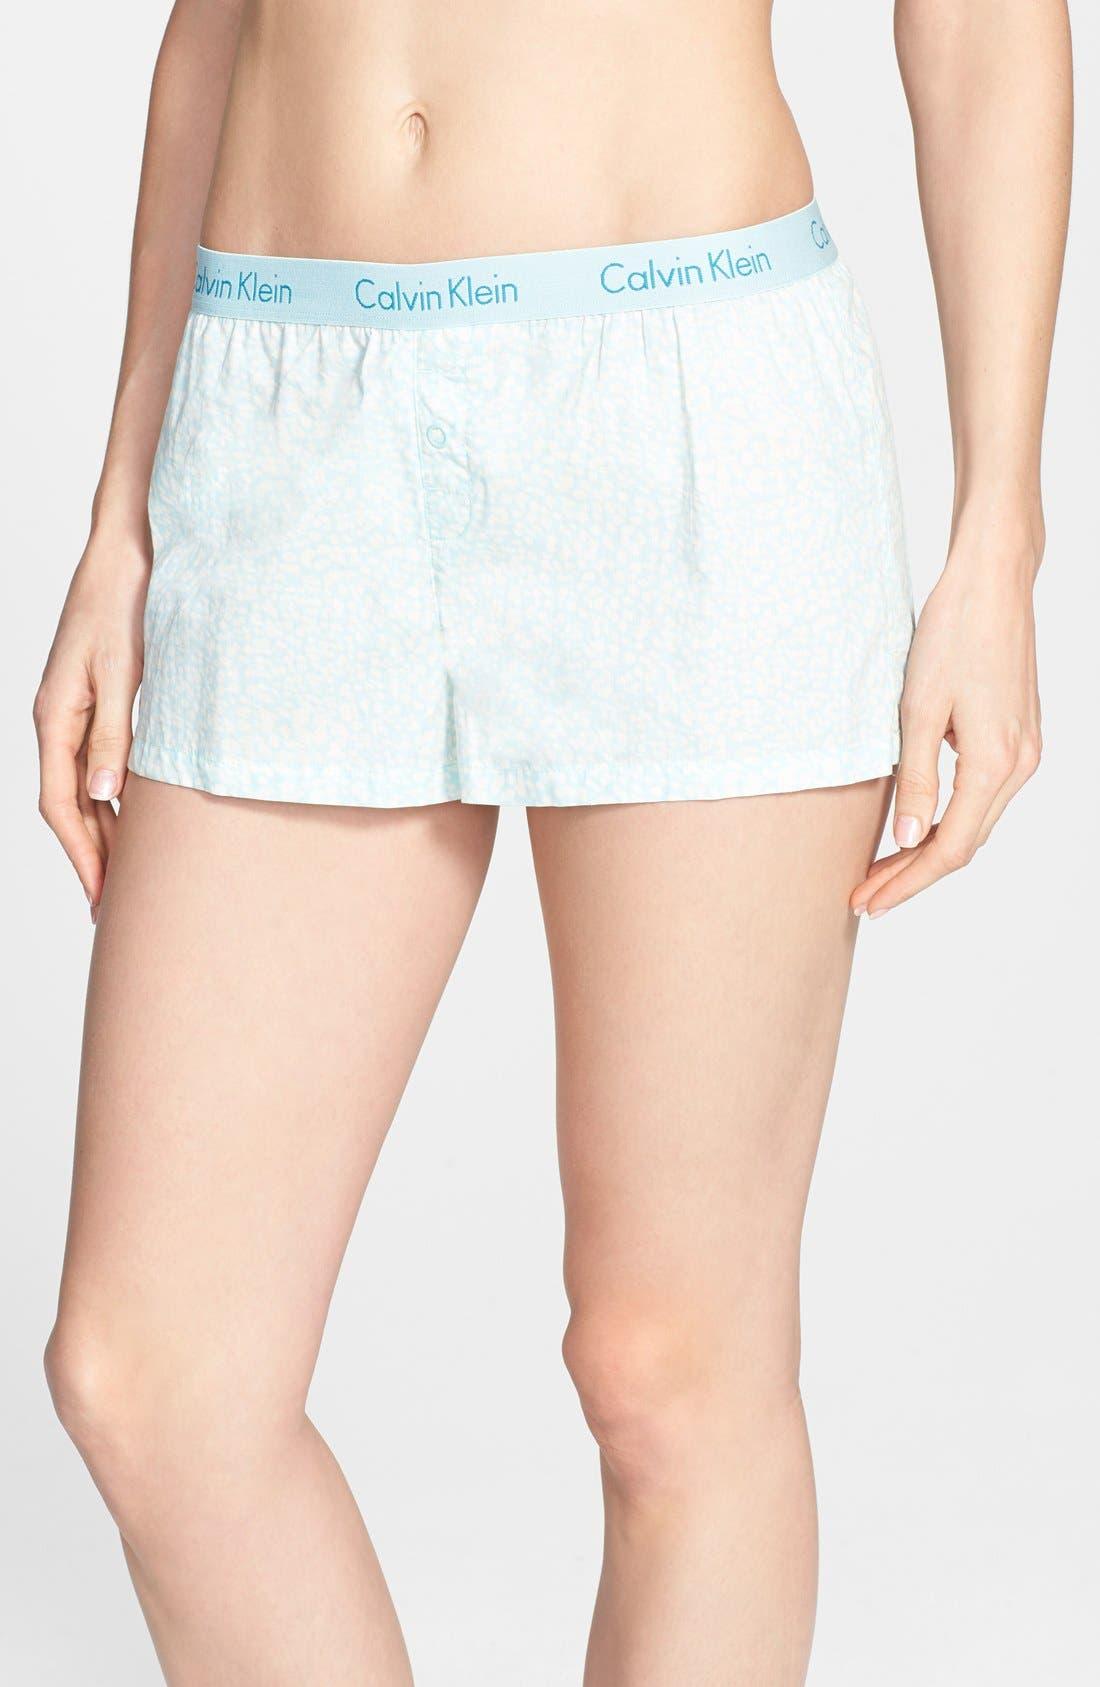 Alternate Image 1 Selected - Calvin Klein 'Cabachon Floral' Boxer Shorts